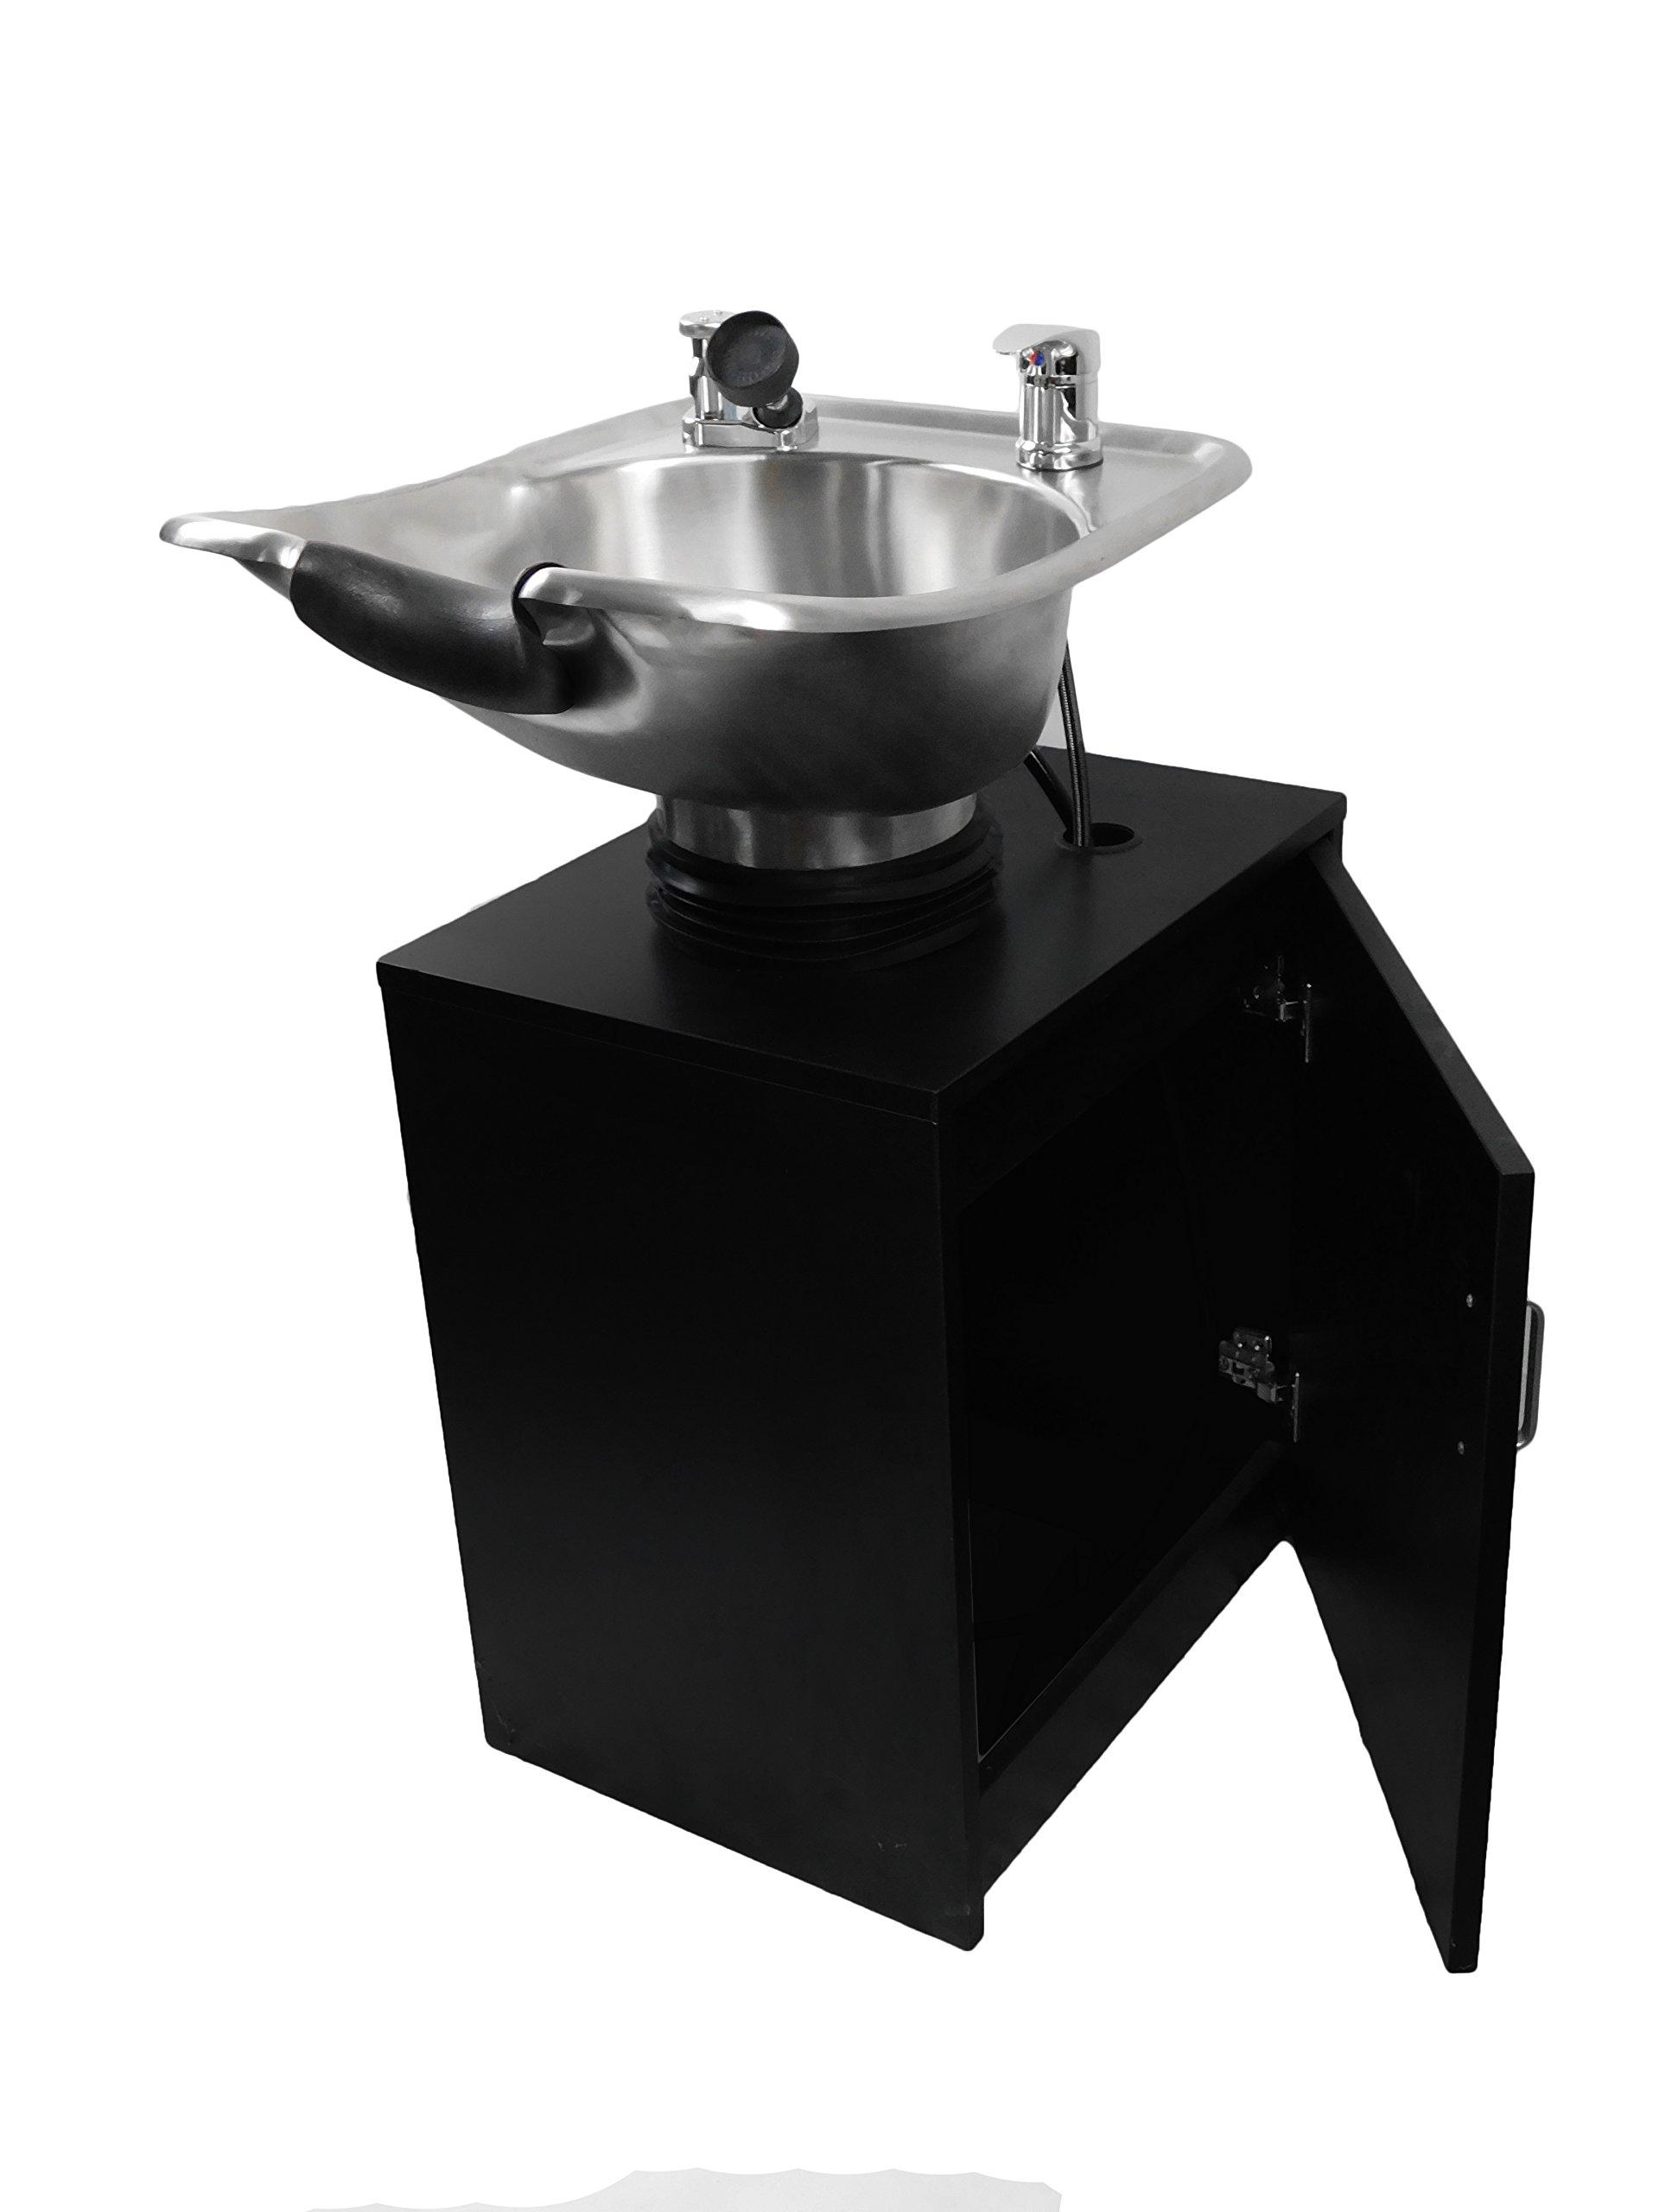 TILTING Brushed Stainless Steel Salon Shampoo Bowl with Black Cabinet Spa Equipment TLC-1567Tilt-C